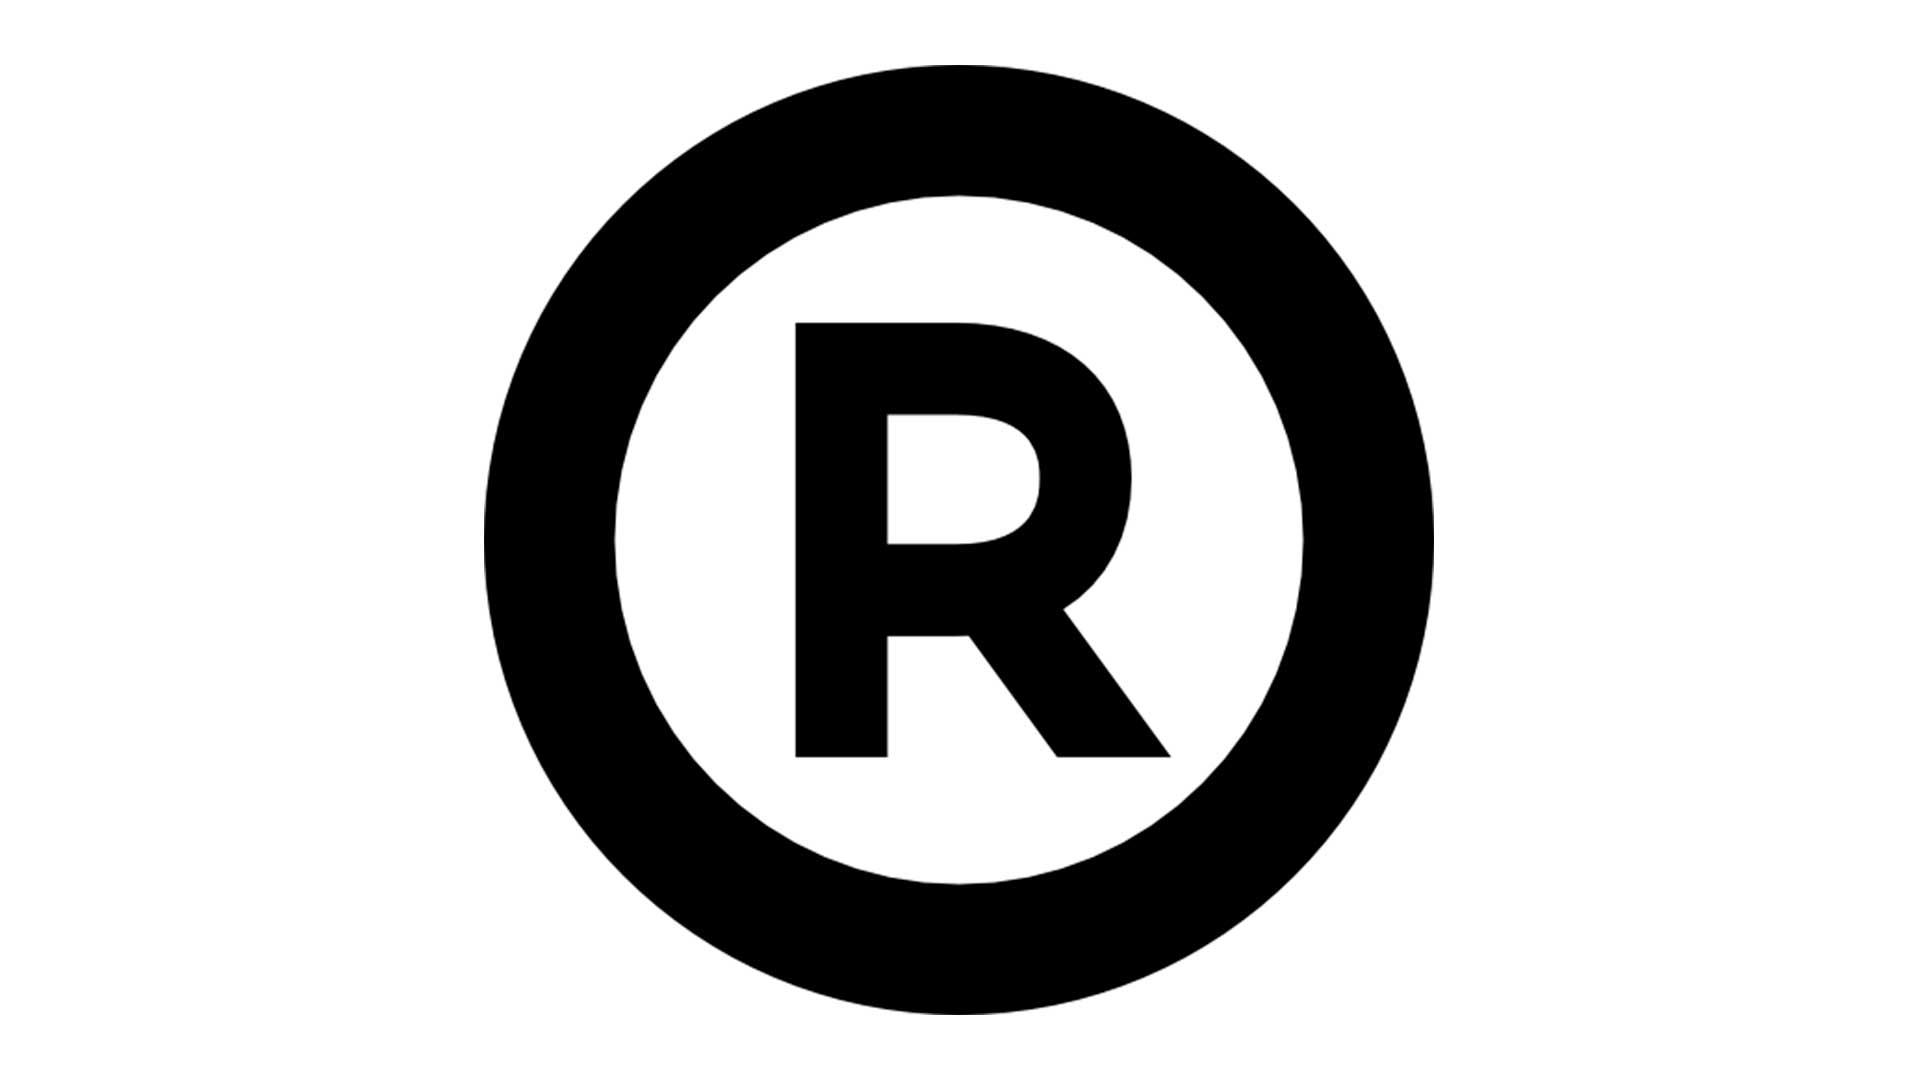 Marca registrada simbolo clipart freeuse download R Marca Registrada - Agencia Sidecar freeuse download